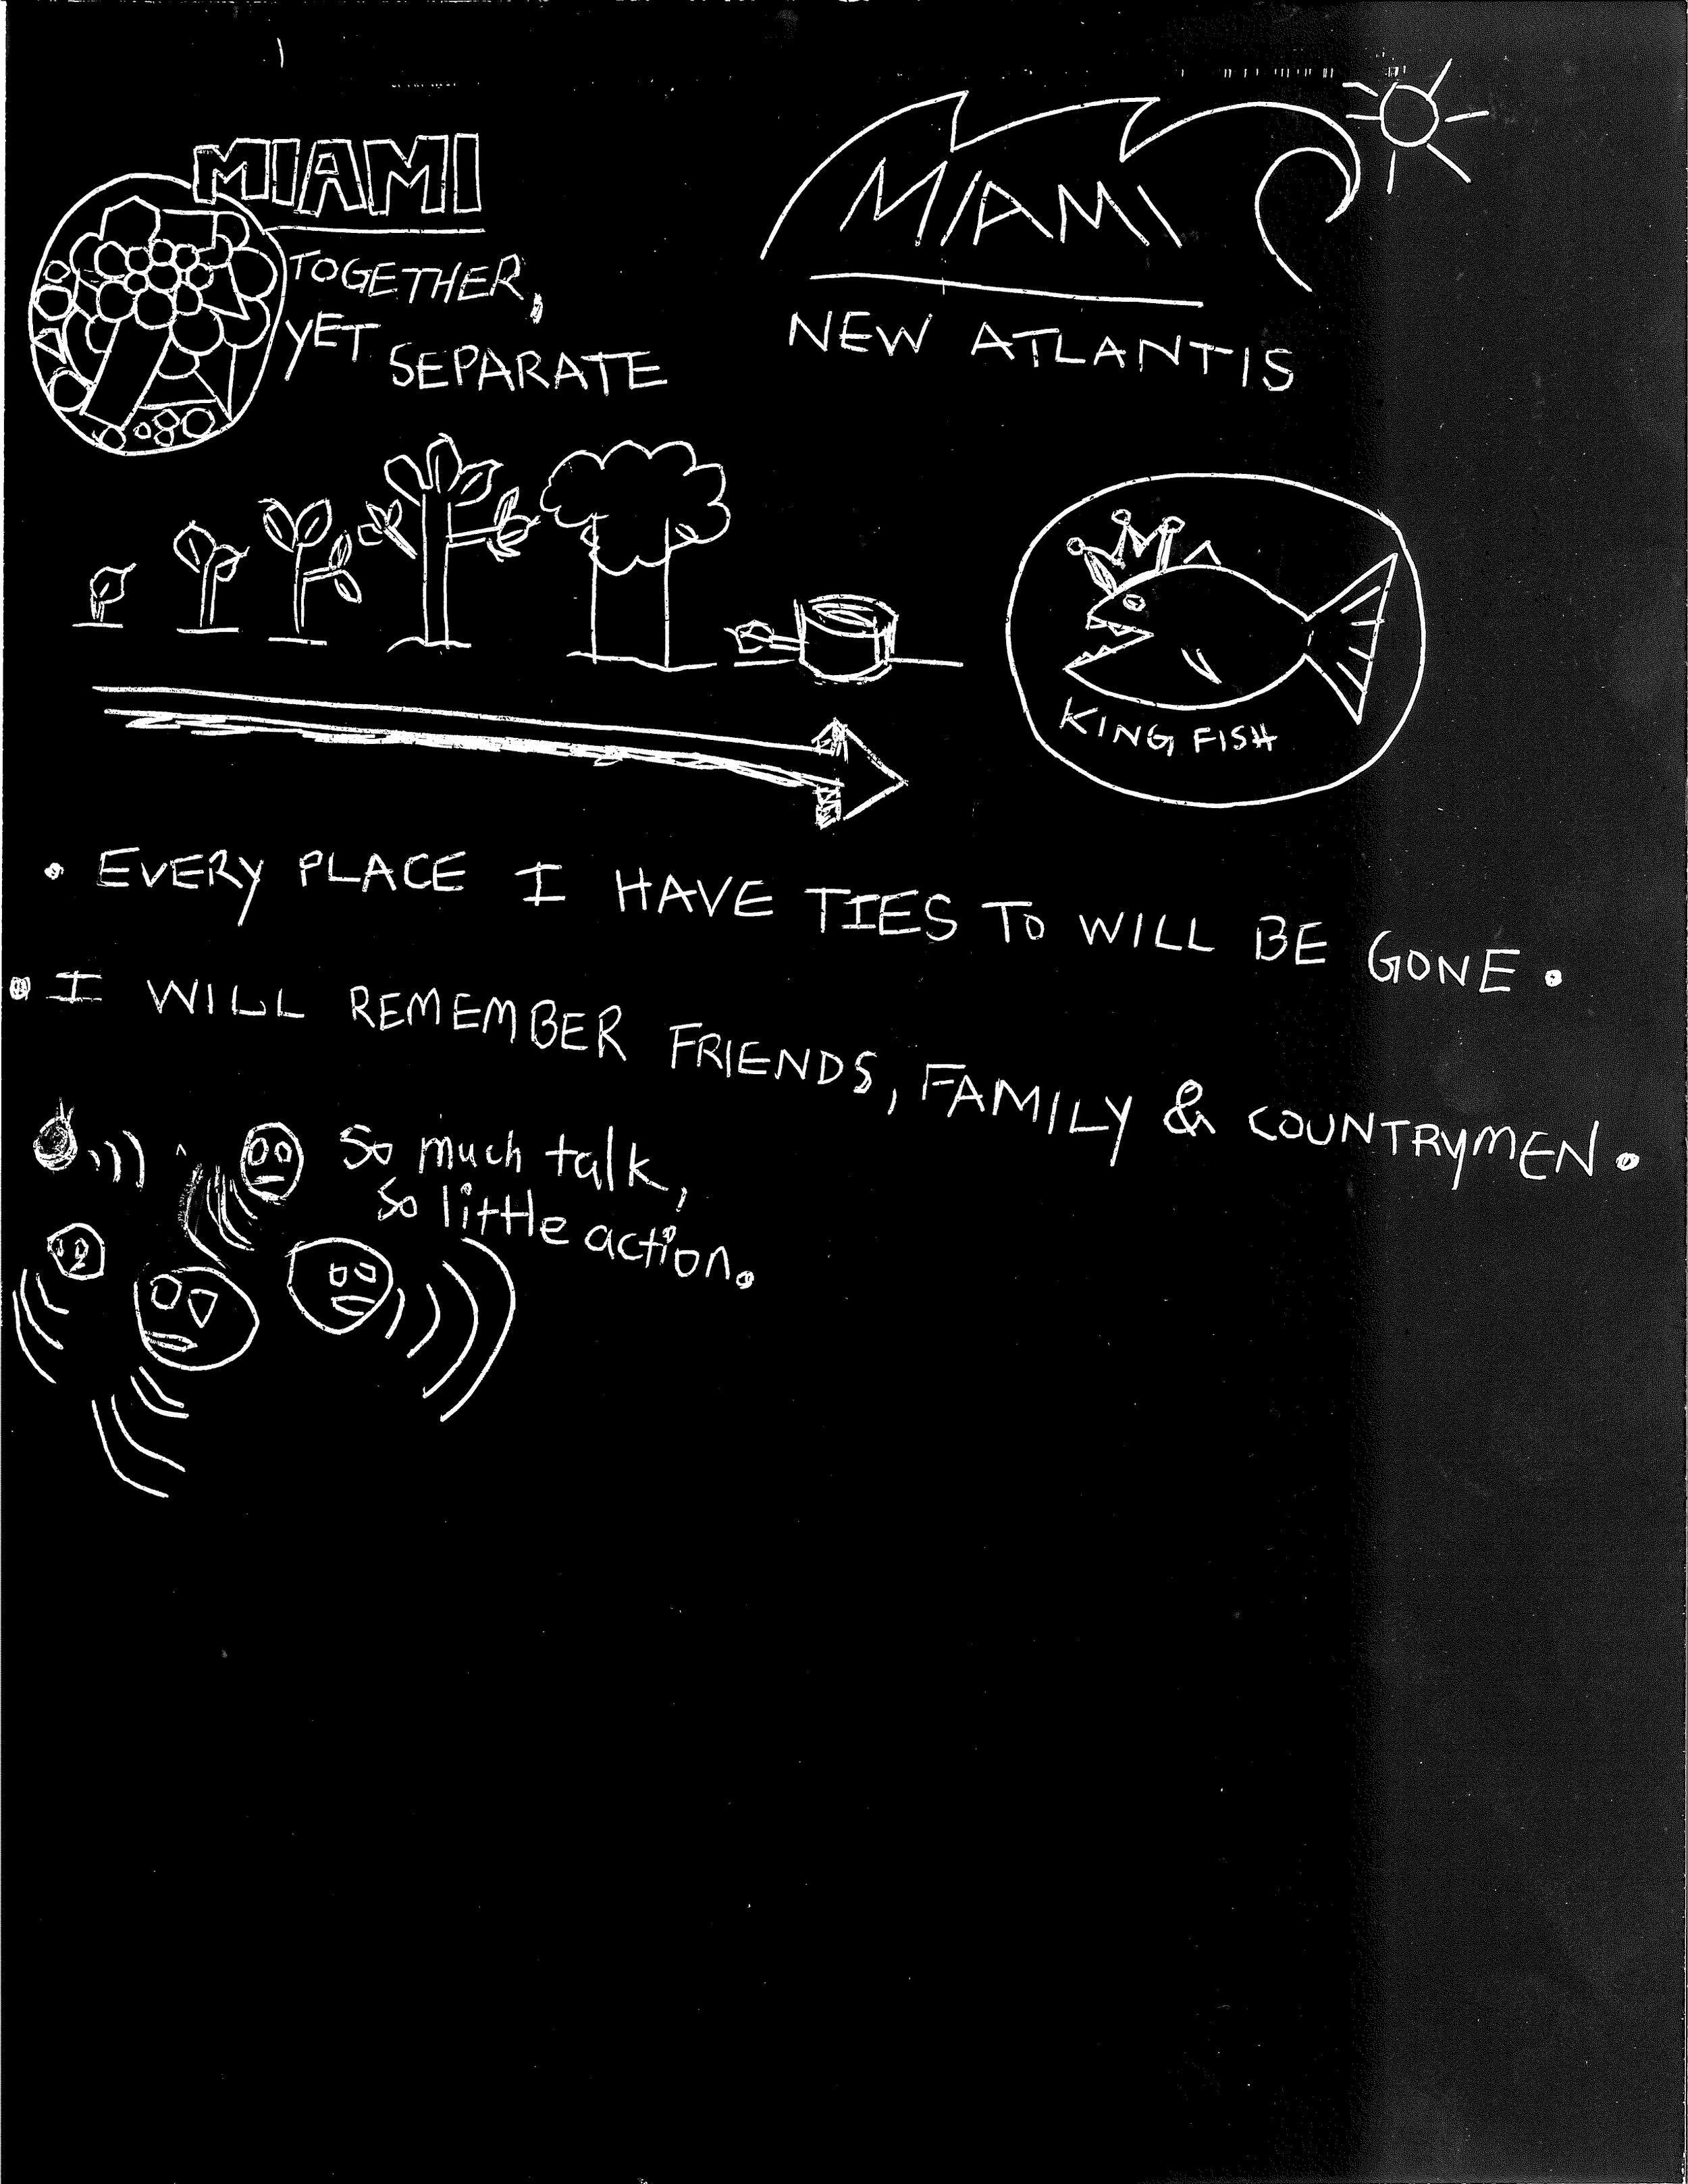 new atlantis.jpg